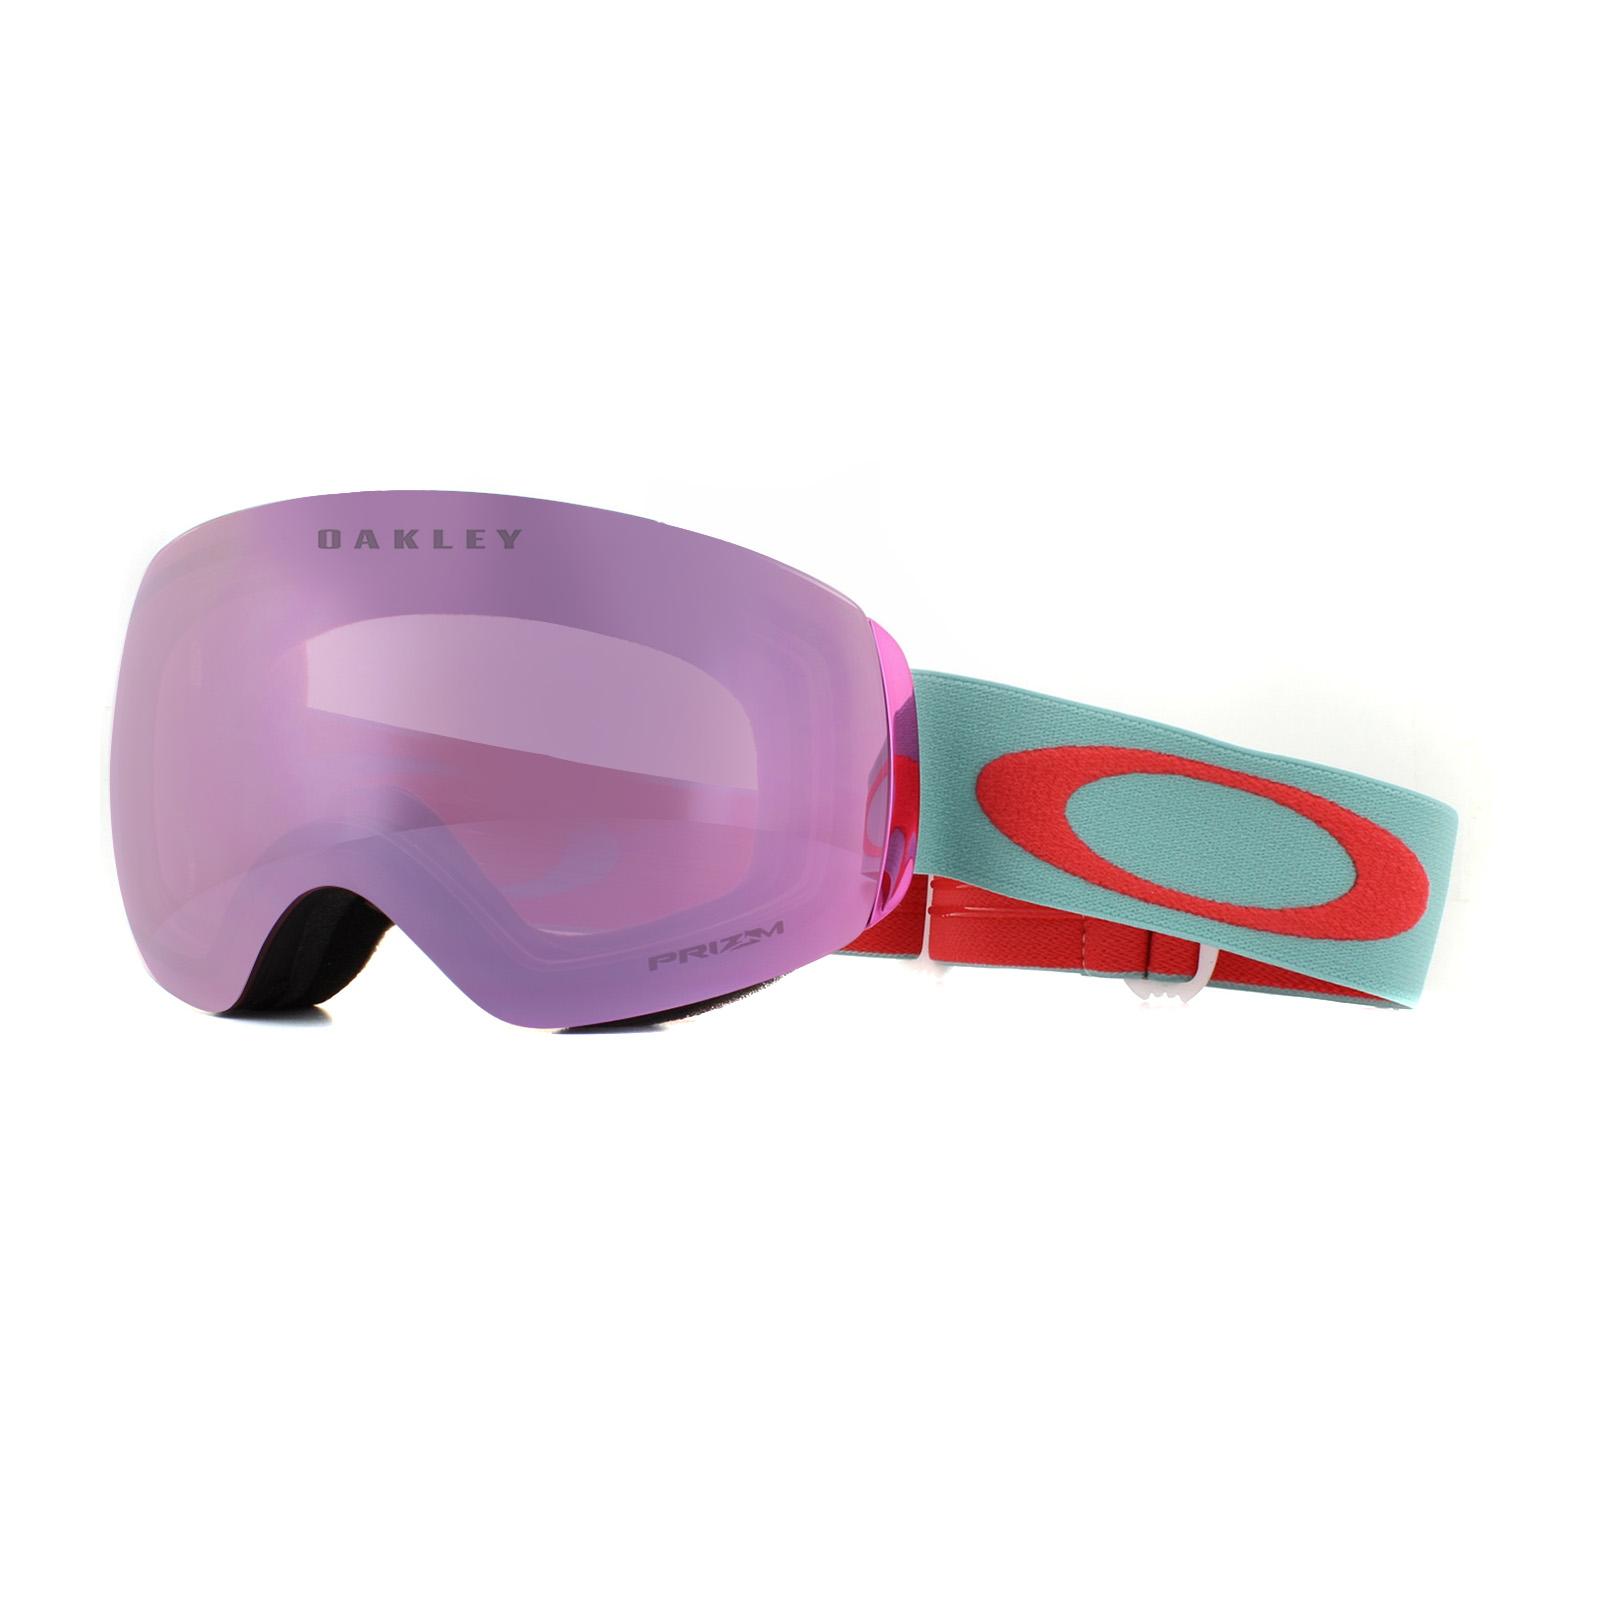 bf80d21411e Sentinel Oakley Ski Goggles Flight Deck XM OO7064-77 Arctic Surf Coral  Prizm HI Pink Irid